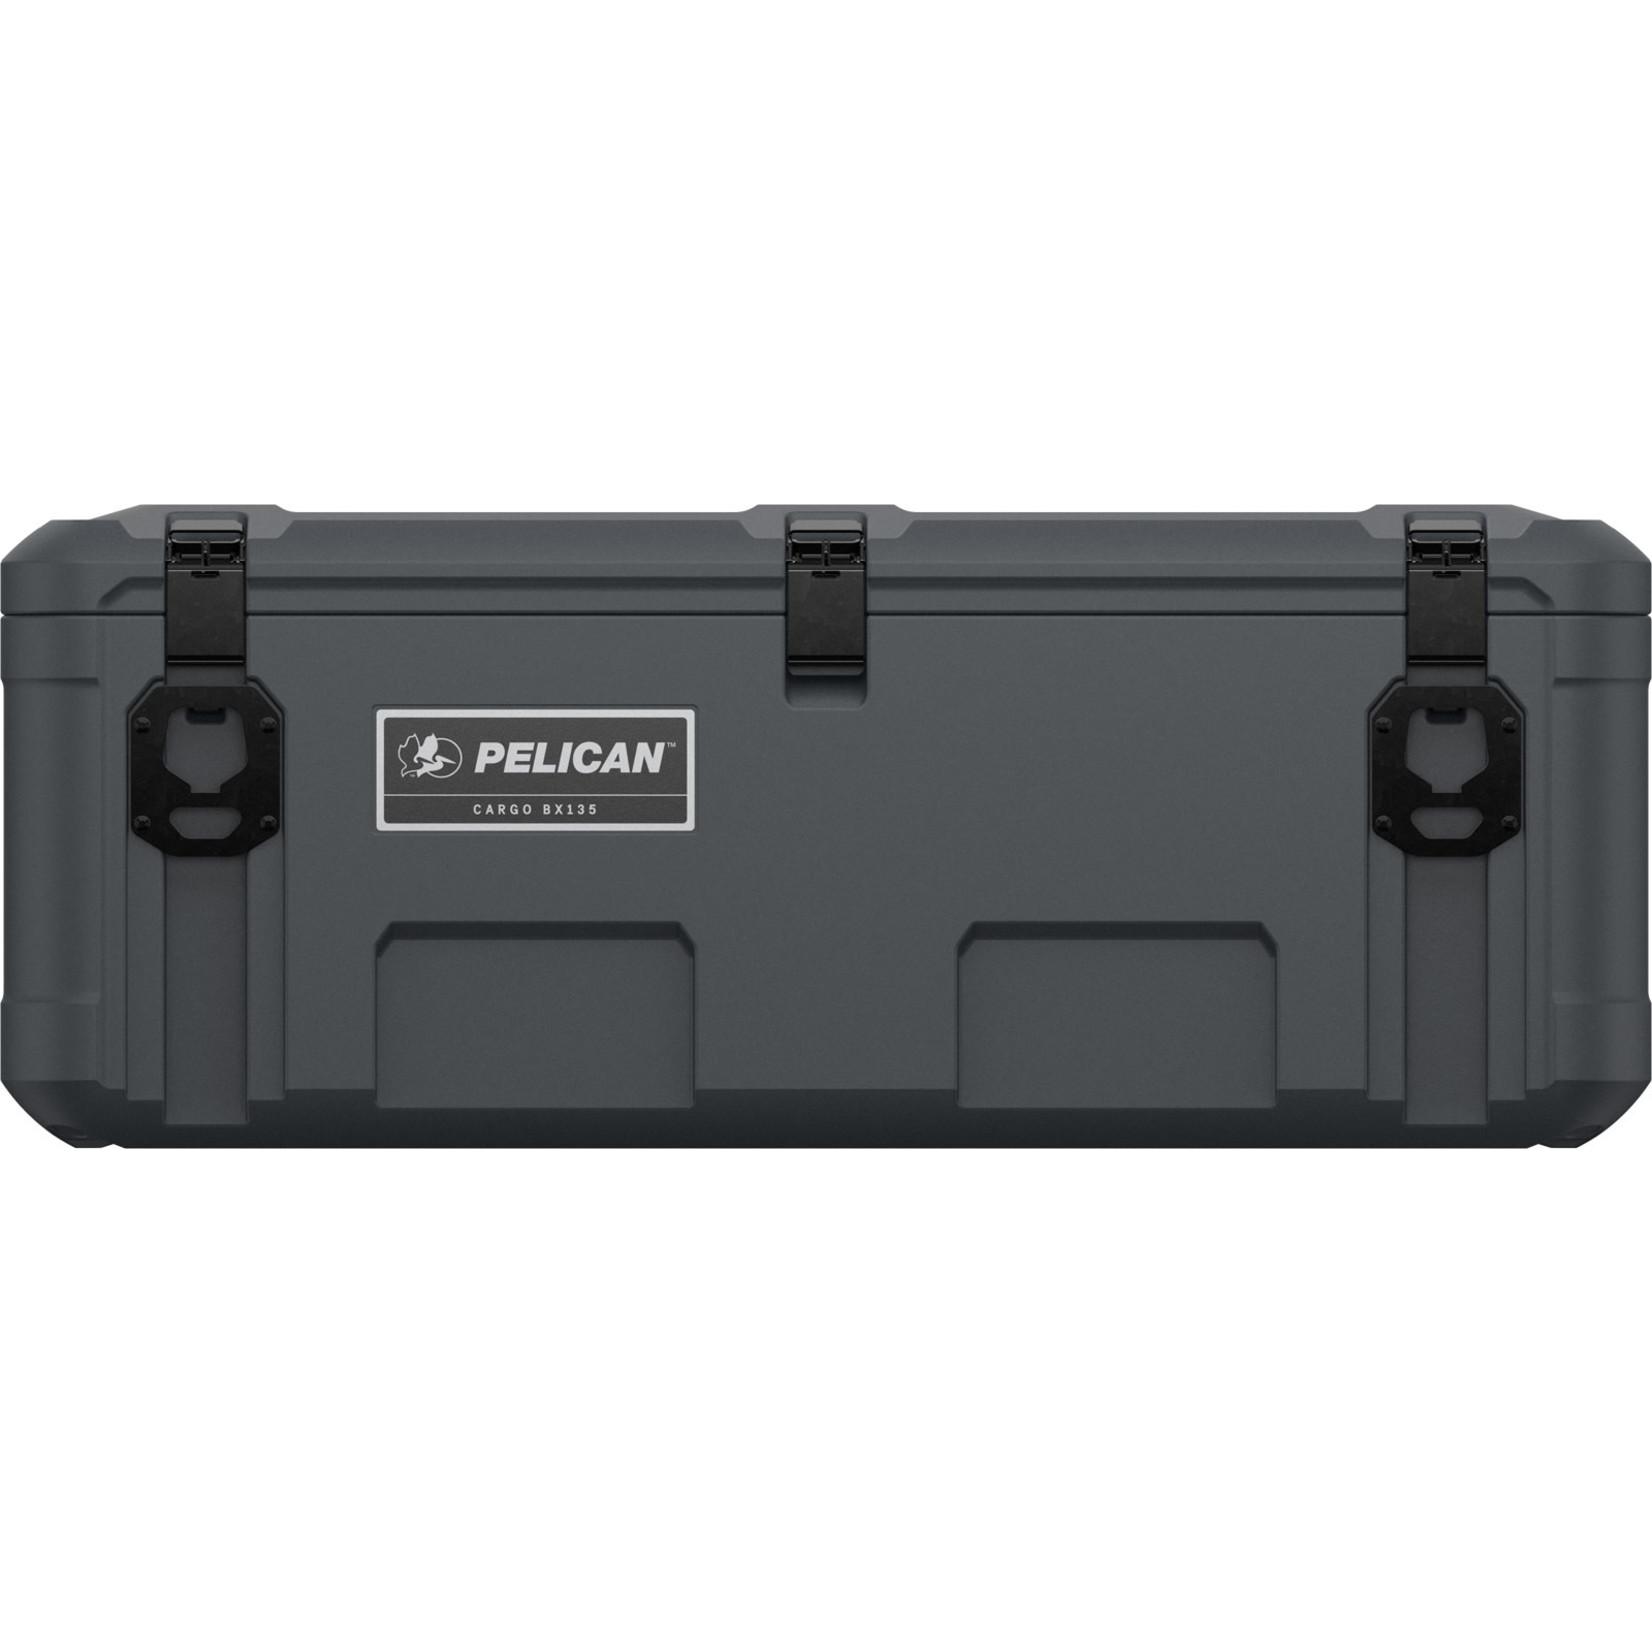 Pelican BX135 Cargo Case Black